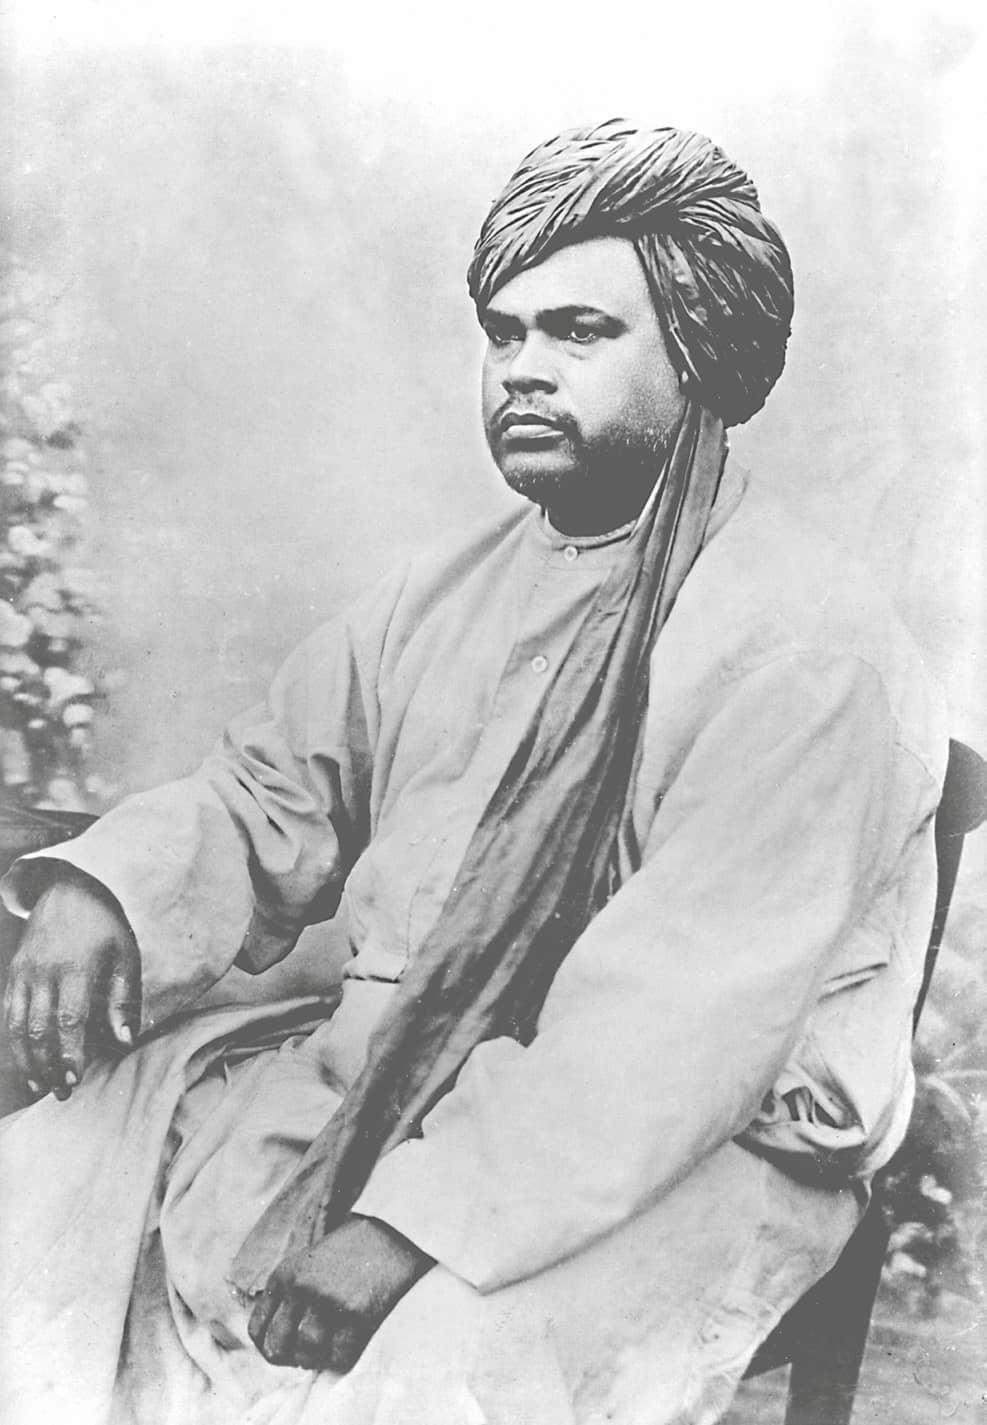 Swami Ramakrishnananda: His Contribution to the Philosophical Tradition of the Ramakrishna Order